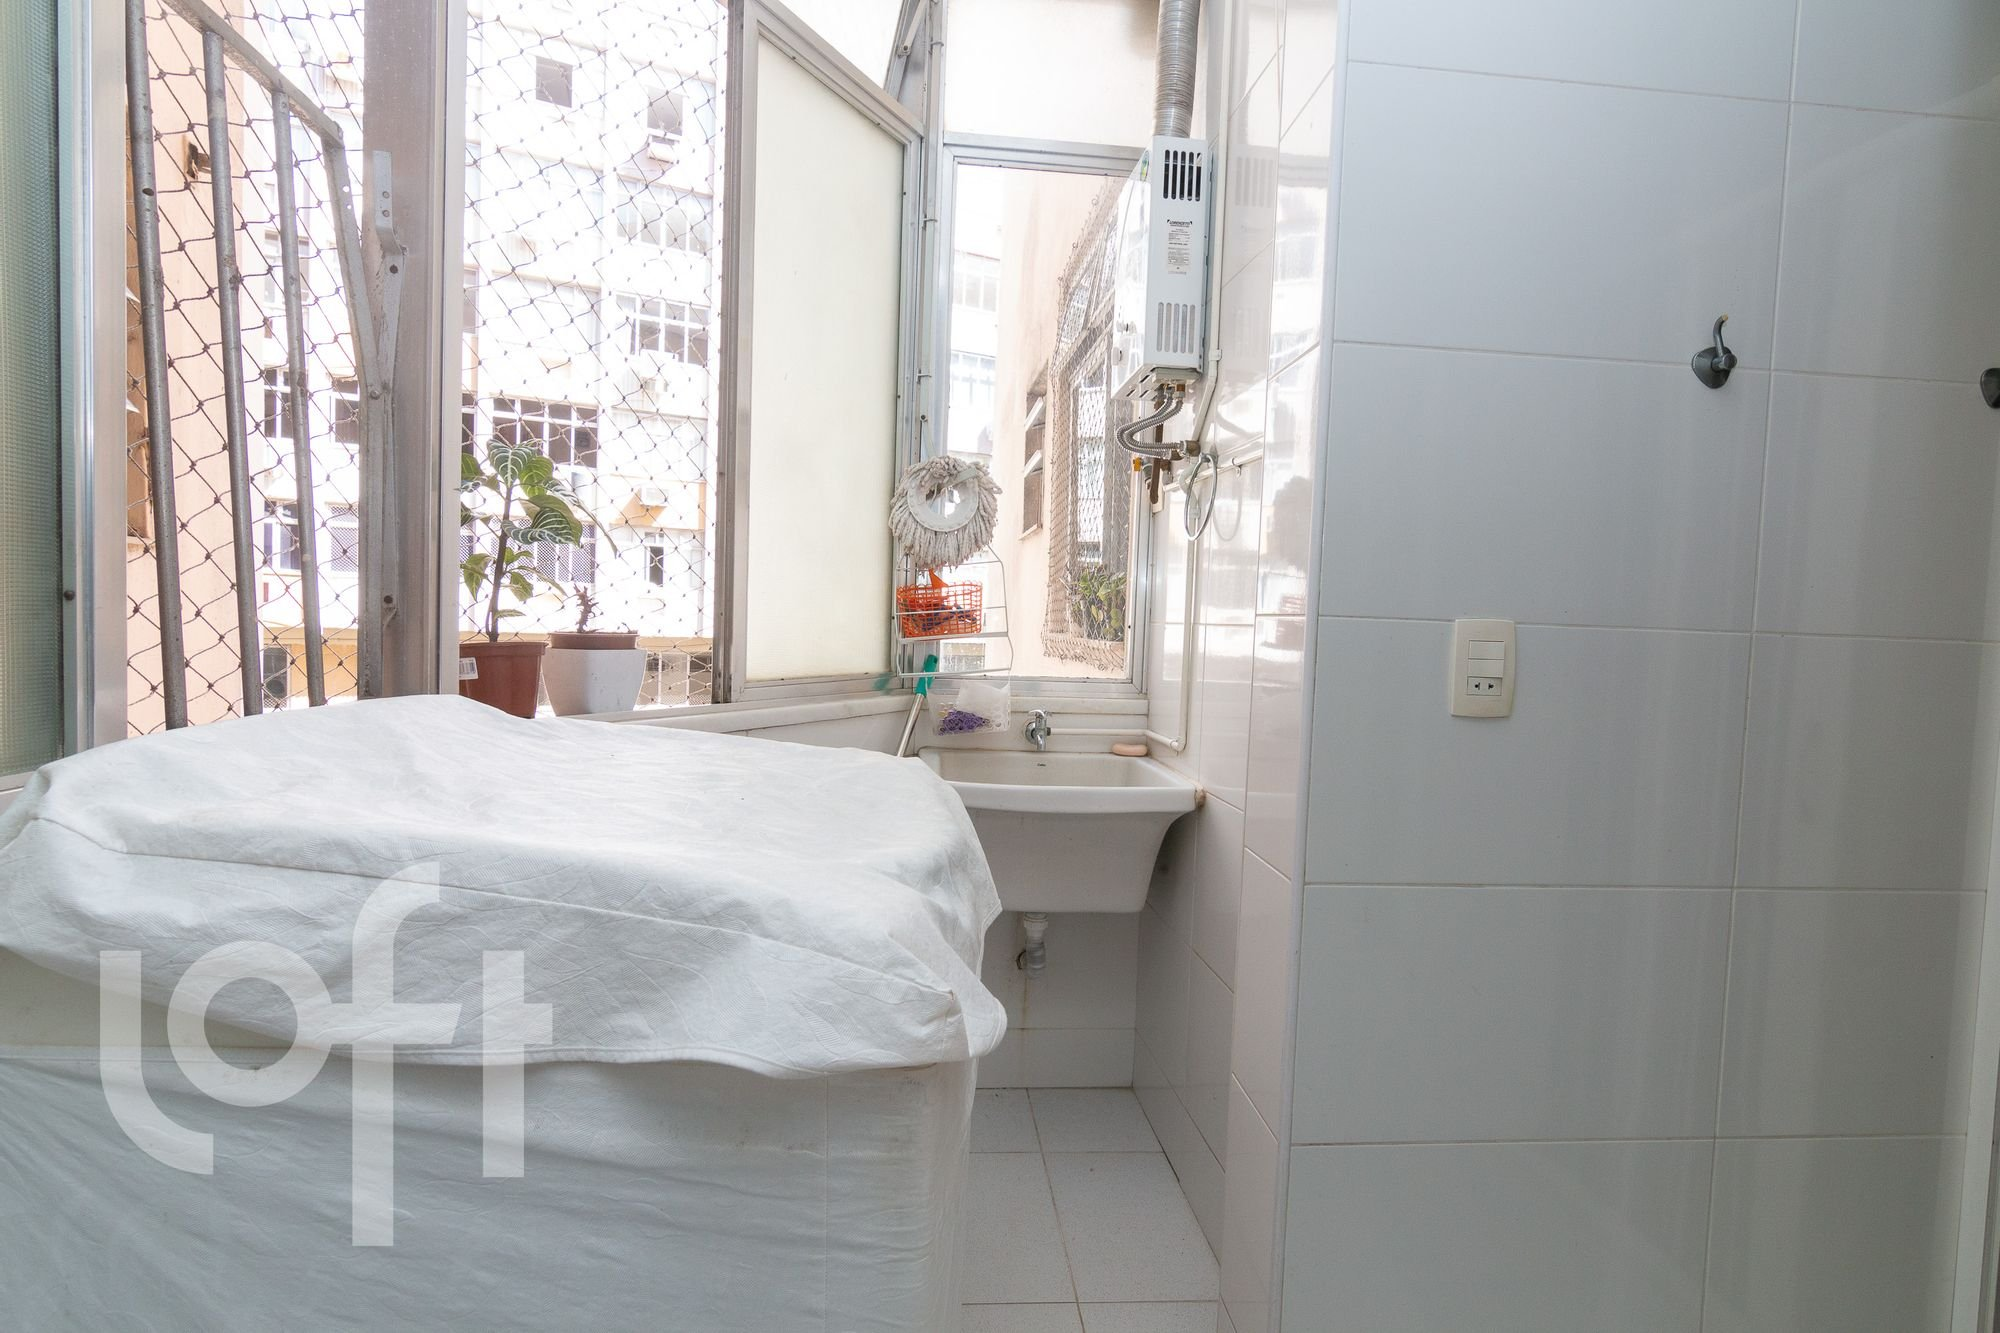 Foto de Lavanderia com cama, pia